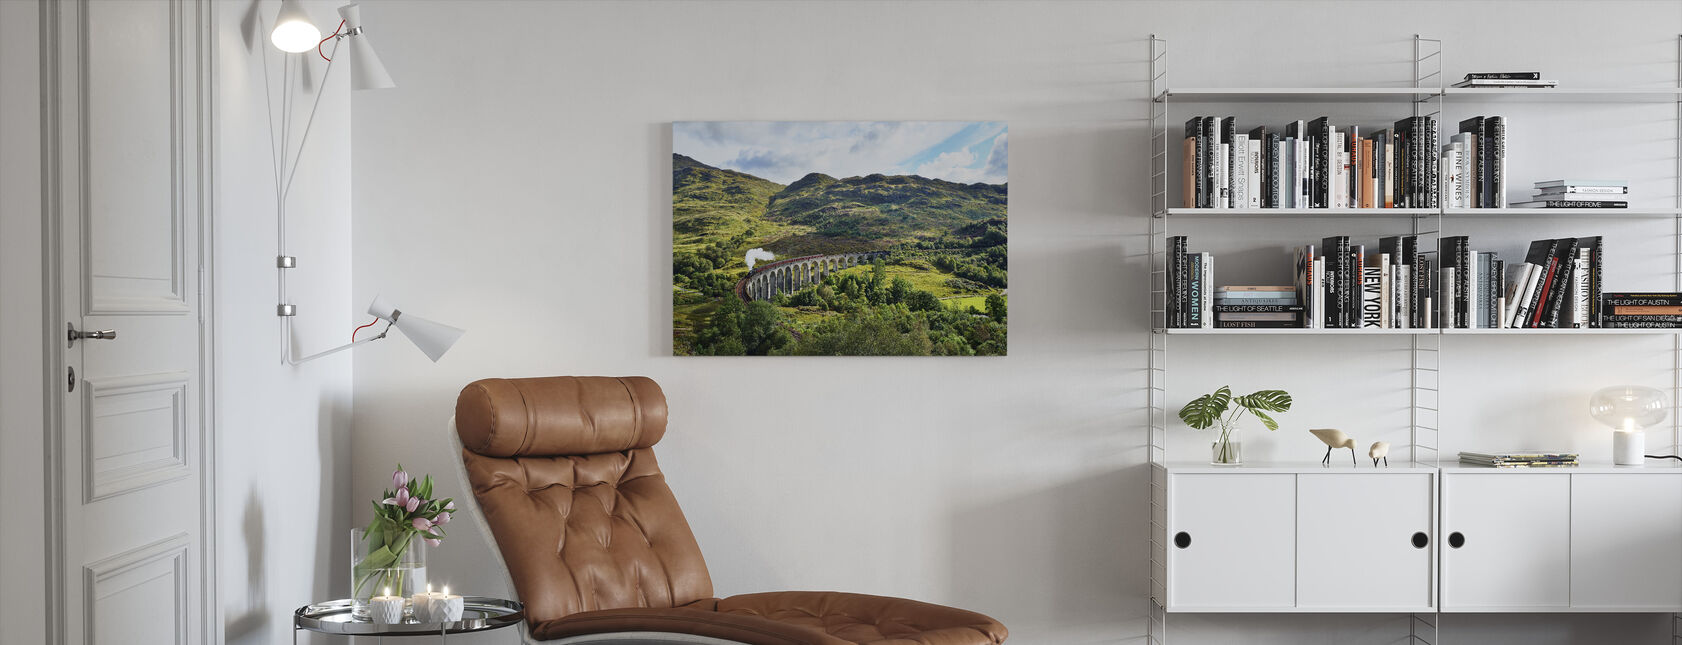 Train at Scotland Highlands - Canvas print - Living Room